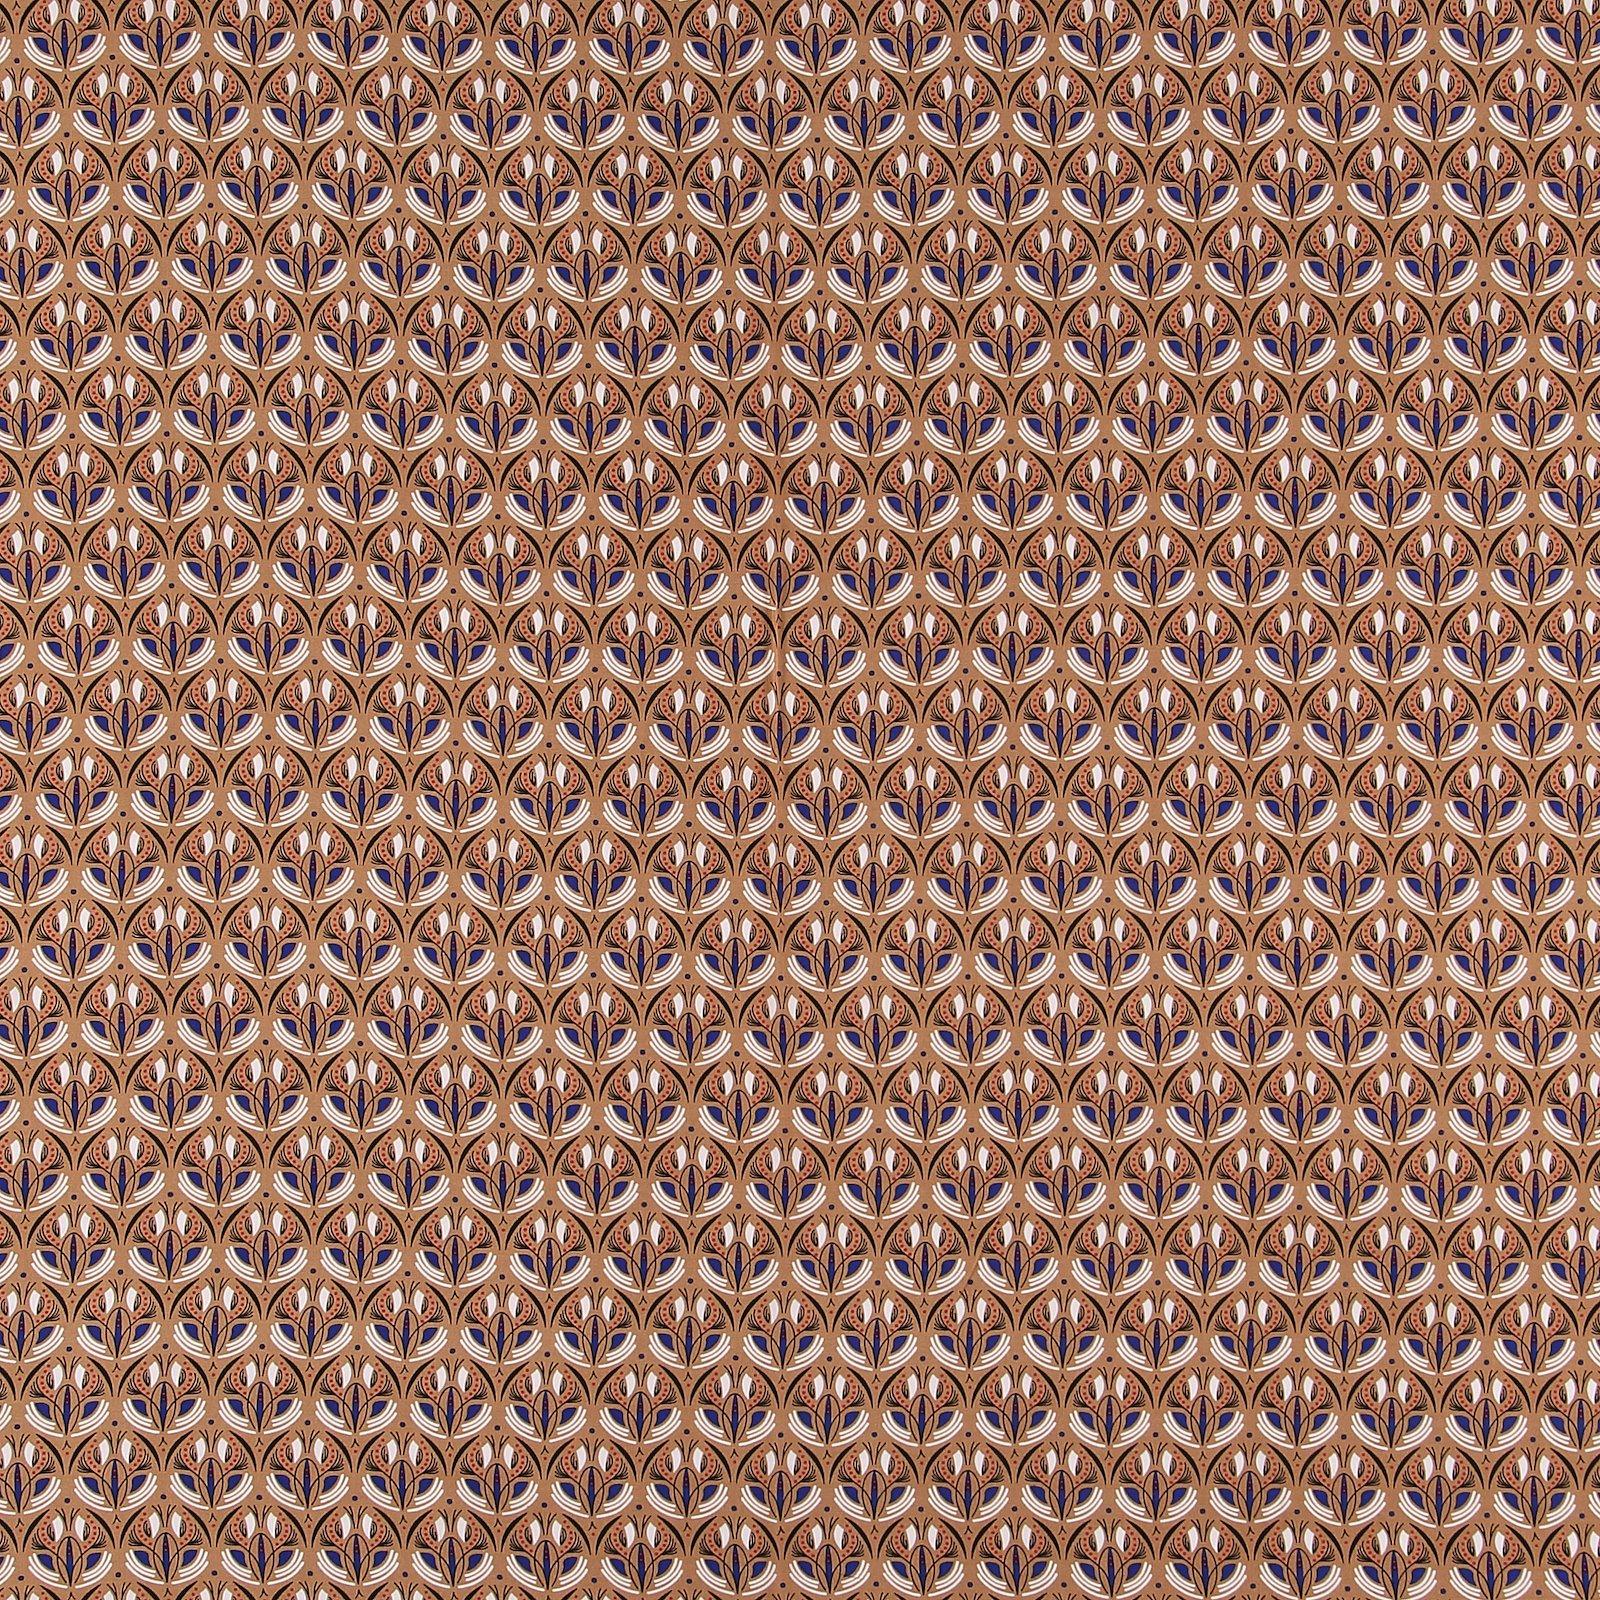 Ecovero woven viscose caramel w print 710671_pack_sp